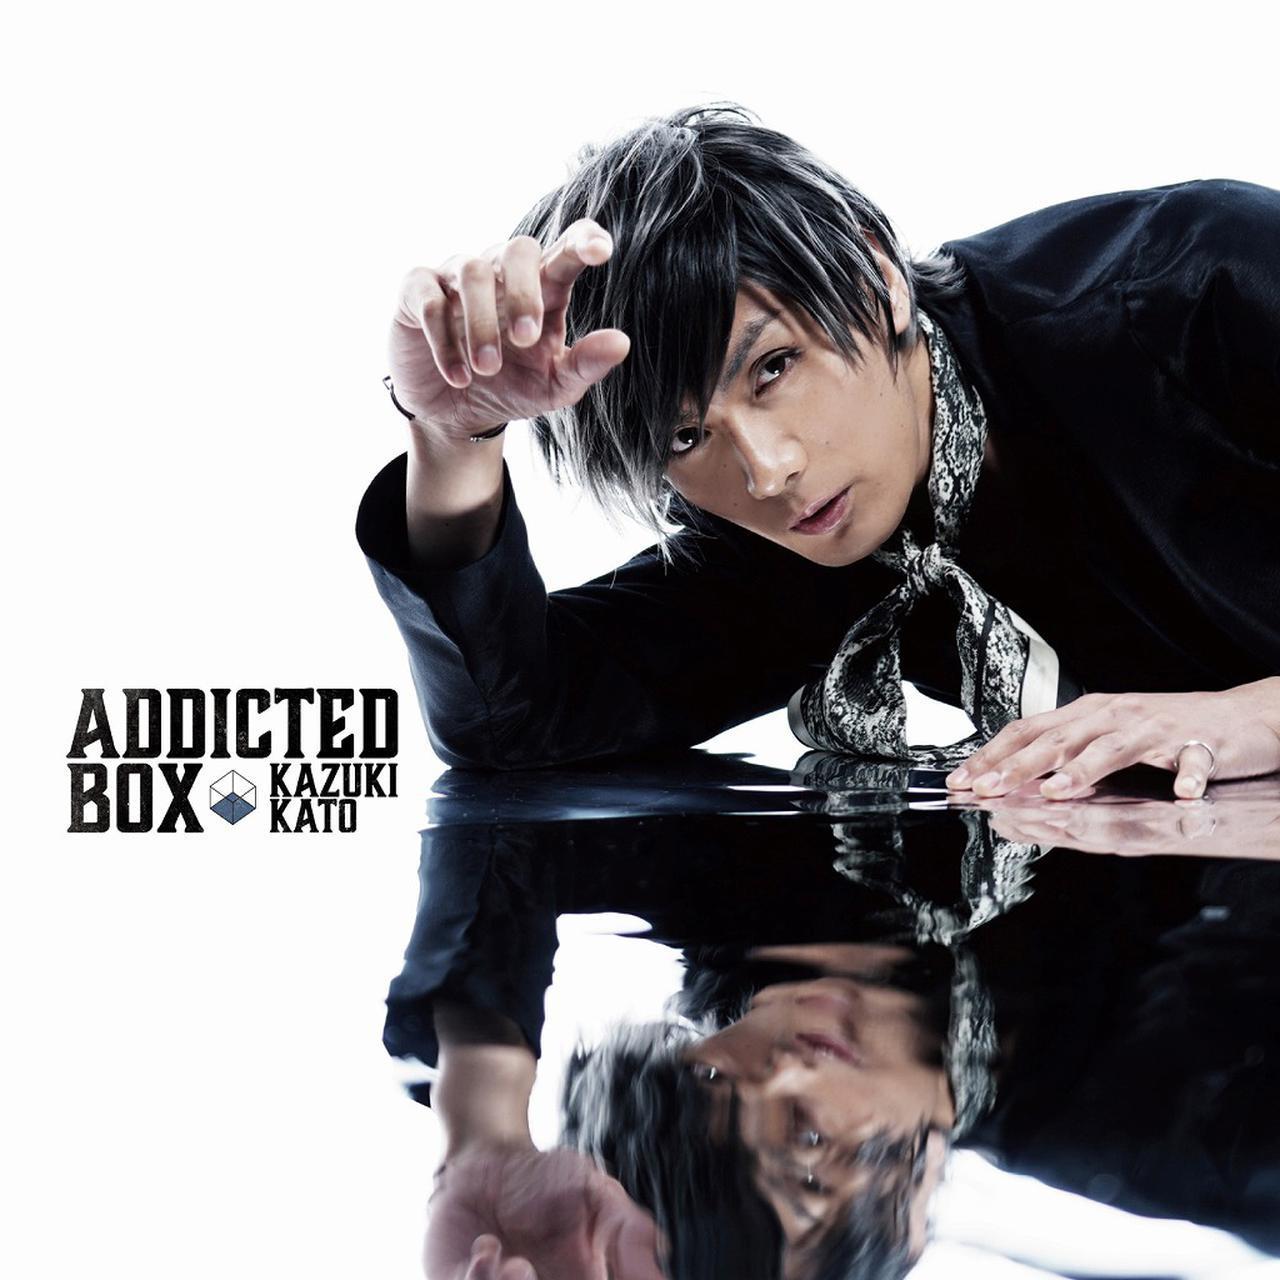 画像: Addicted BOX(TYPE B) / 加藤和樹